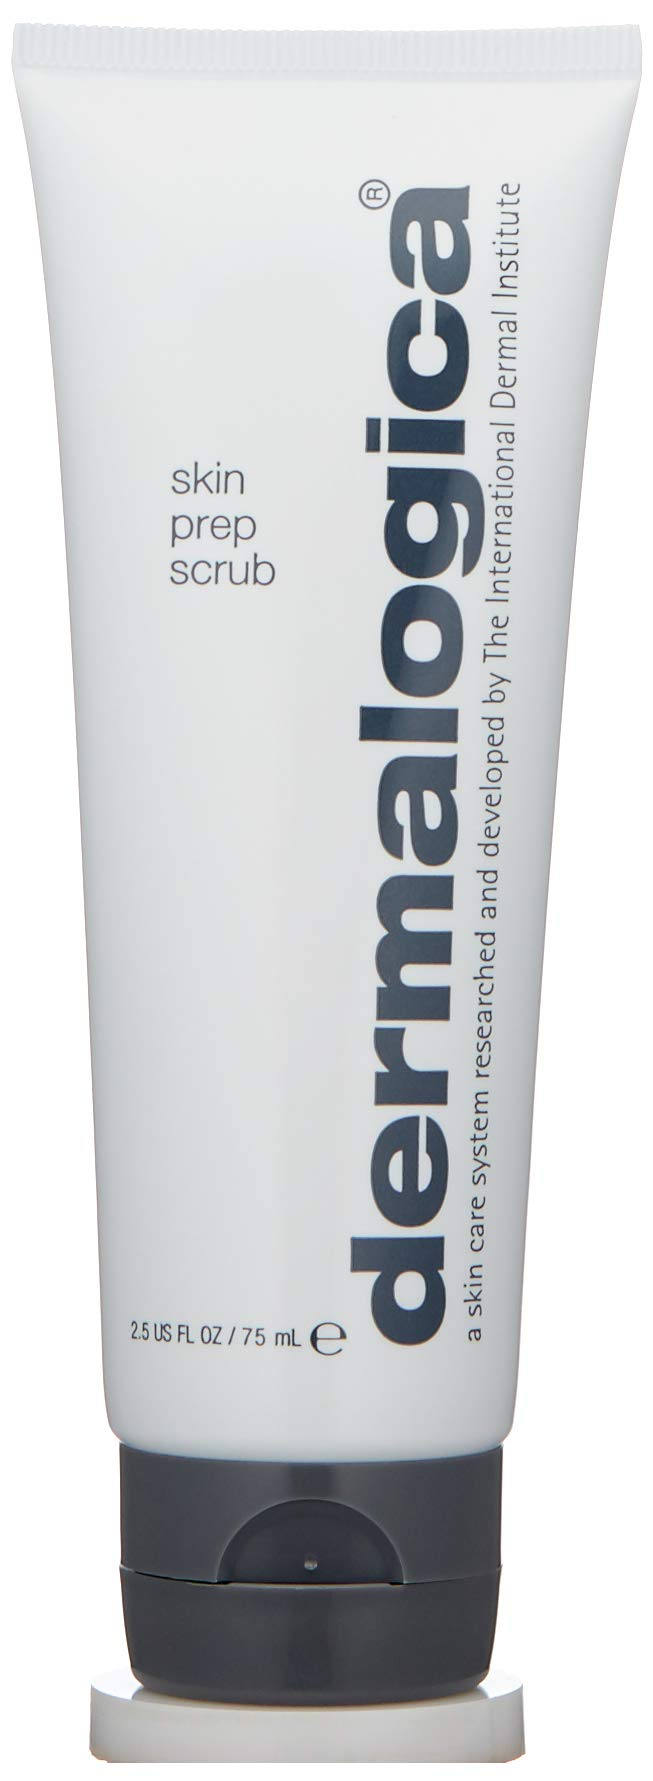 Dermalogica Skin Prep Scrub 2.5 oz by Dermalogica